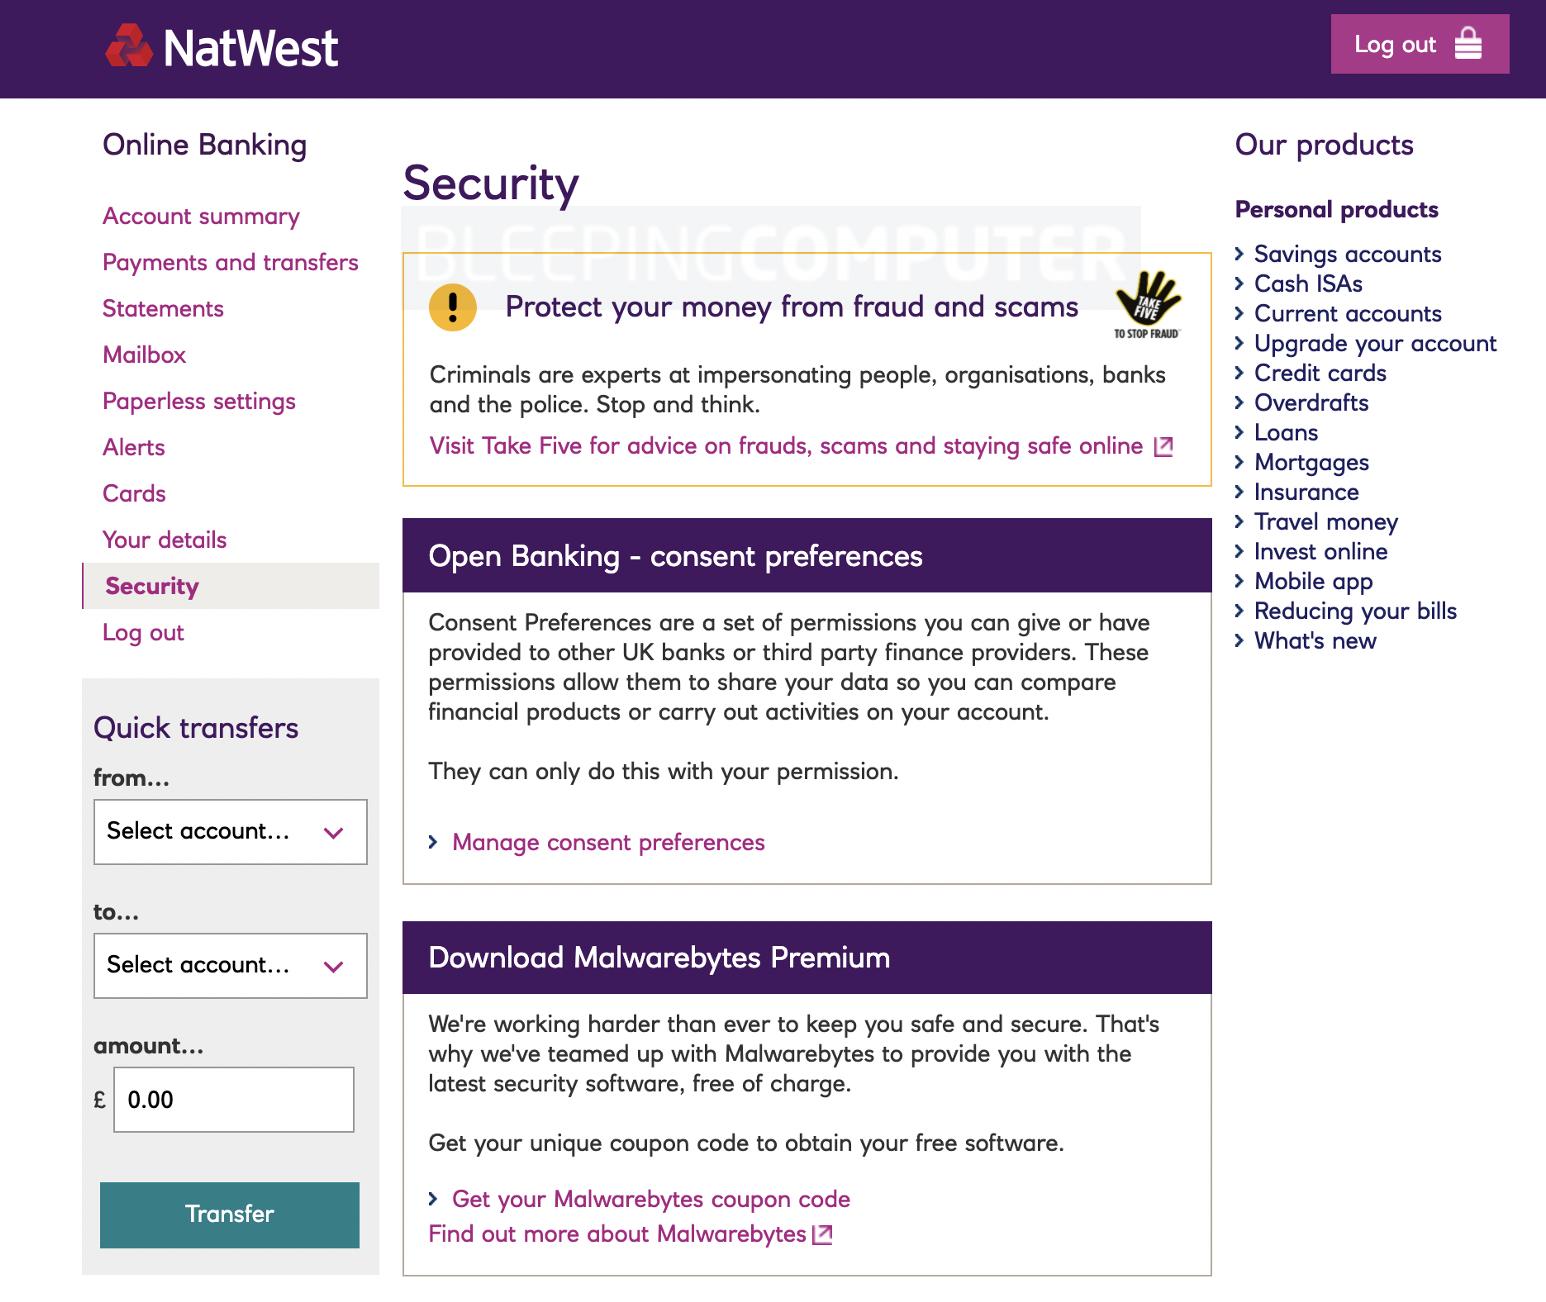 natwest free malwarebytes offer